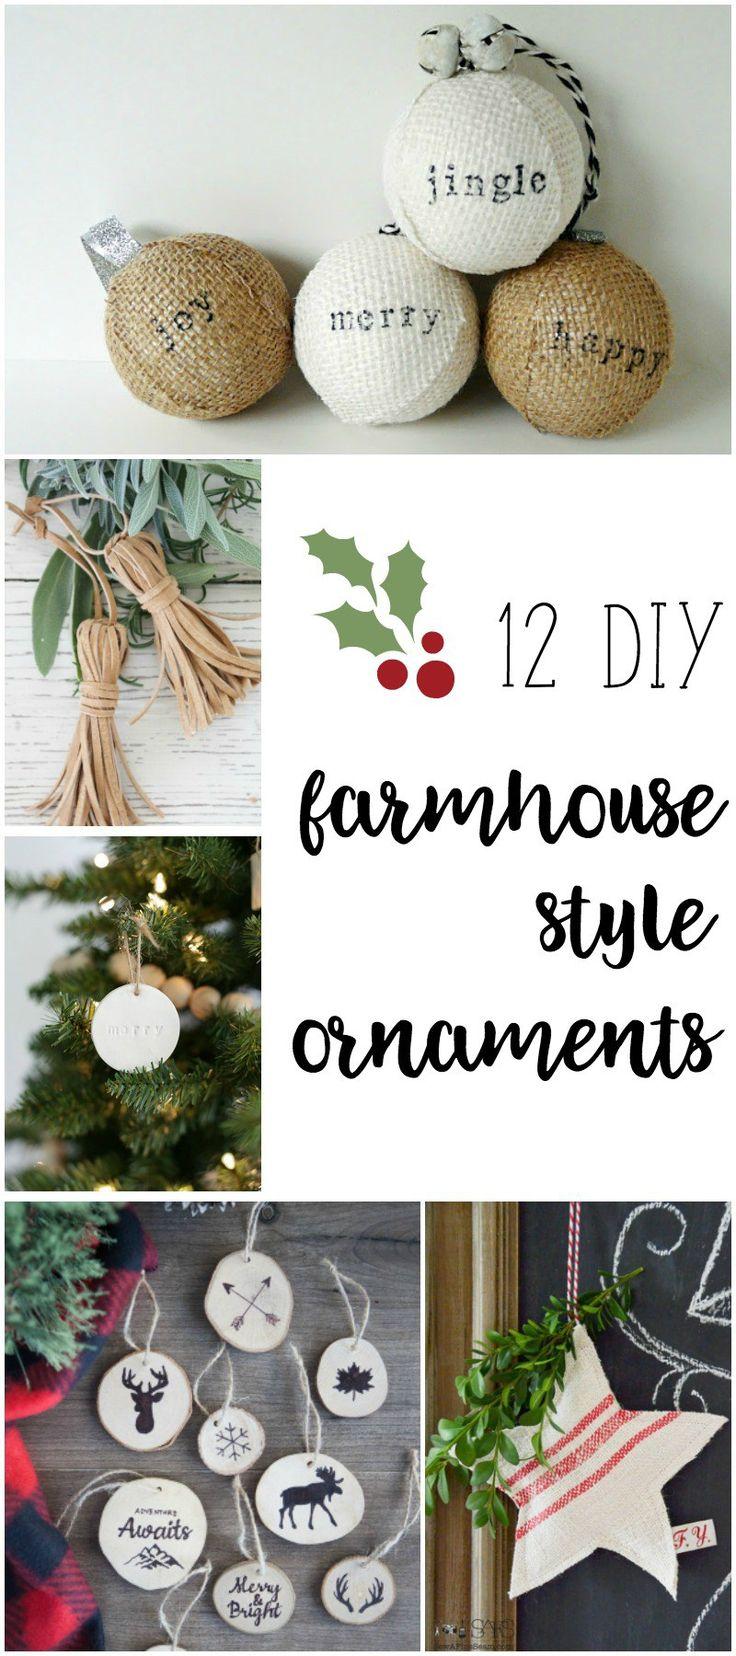 farmhouse style ornaments   diy ornaments   diy christmas   farmhouse ornaments DIY   farmhouse style   christmas ornaments   Christmas ornaments DIY  